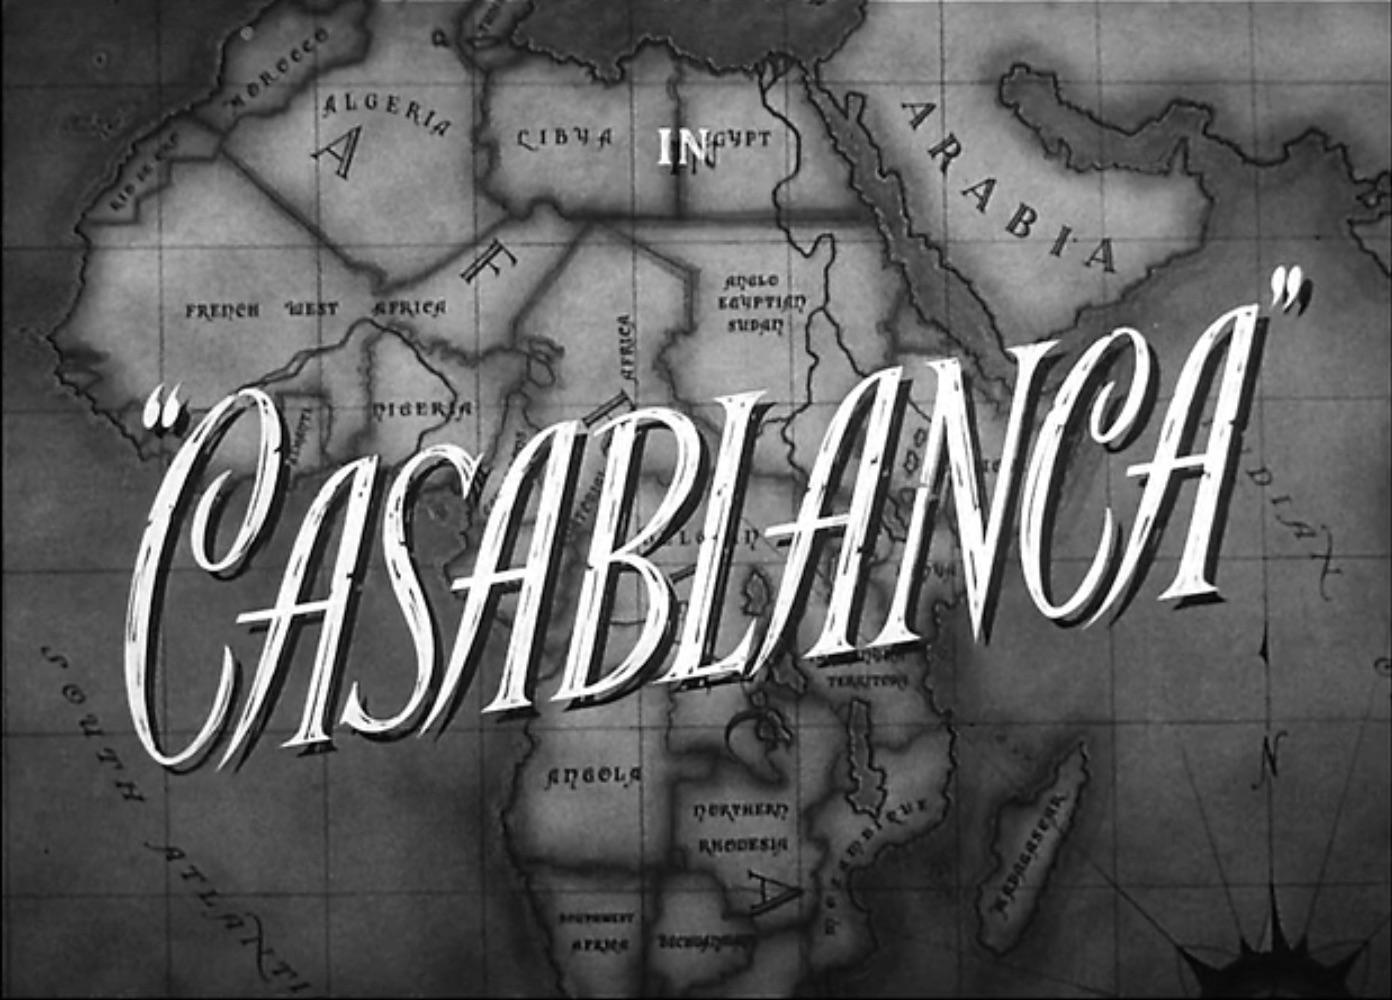 casablanca-title-cel.jpg